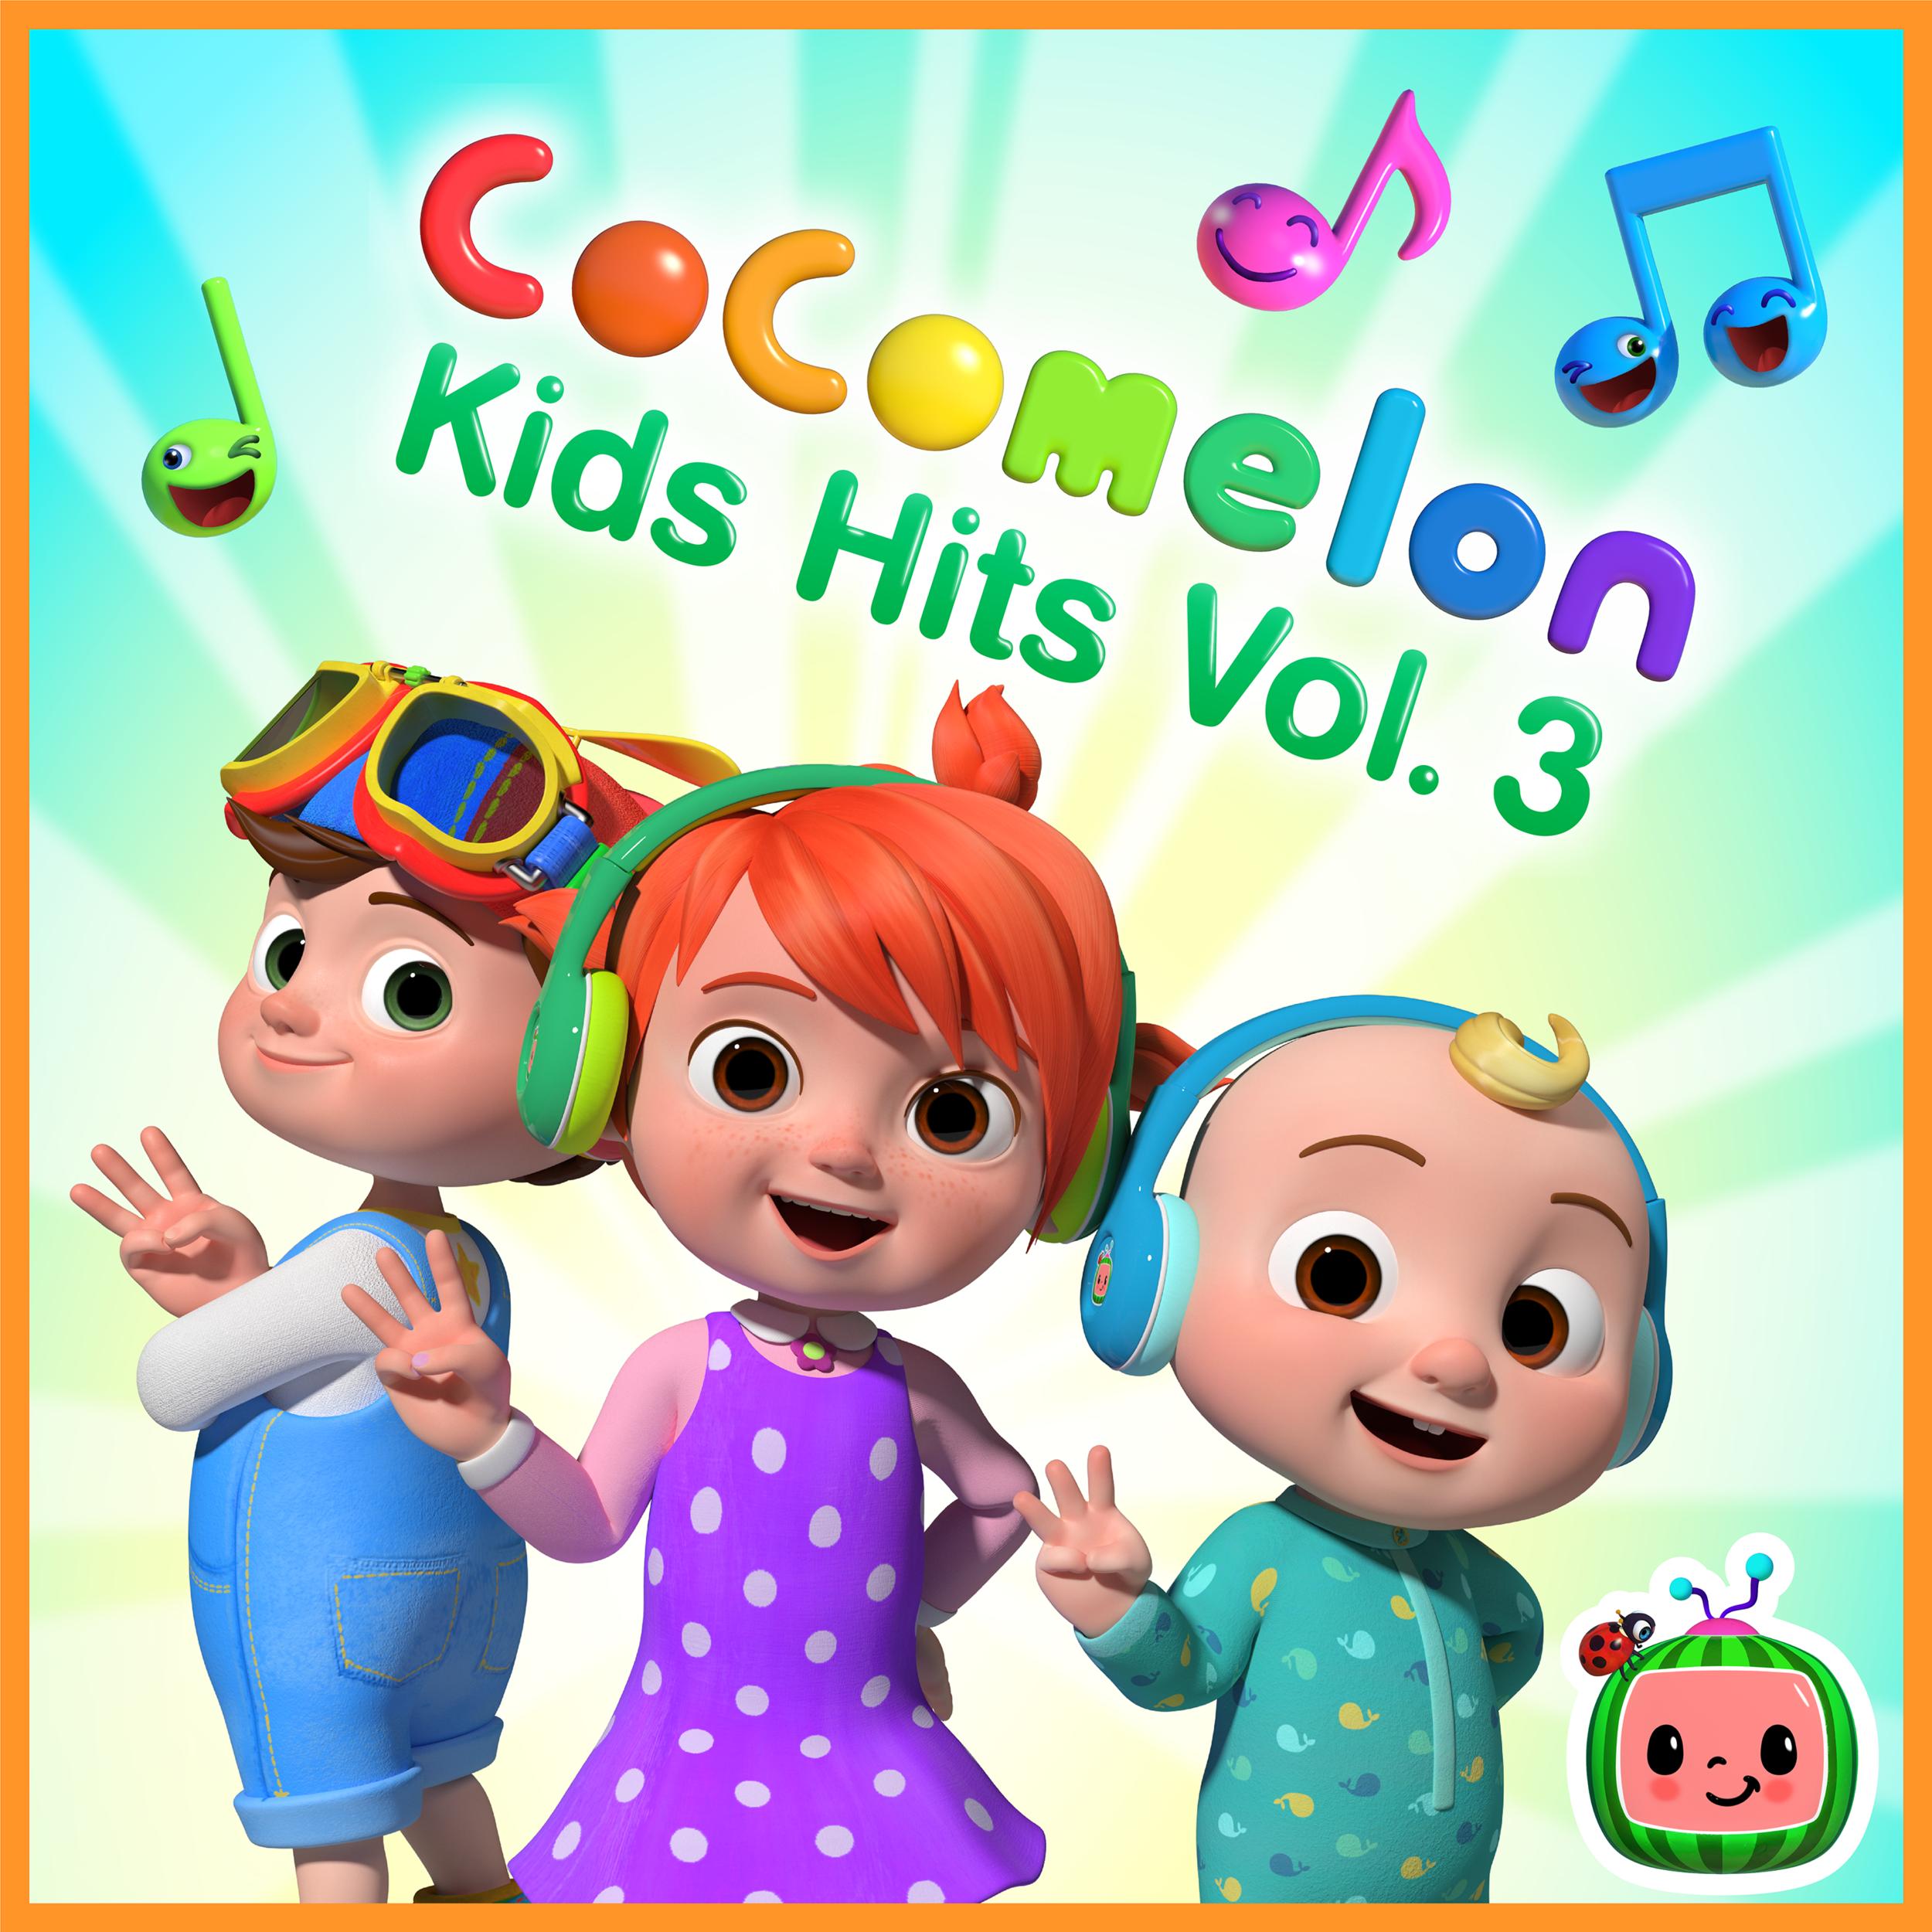 Songs Cocomelon Com